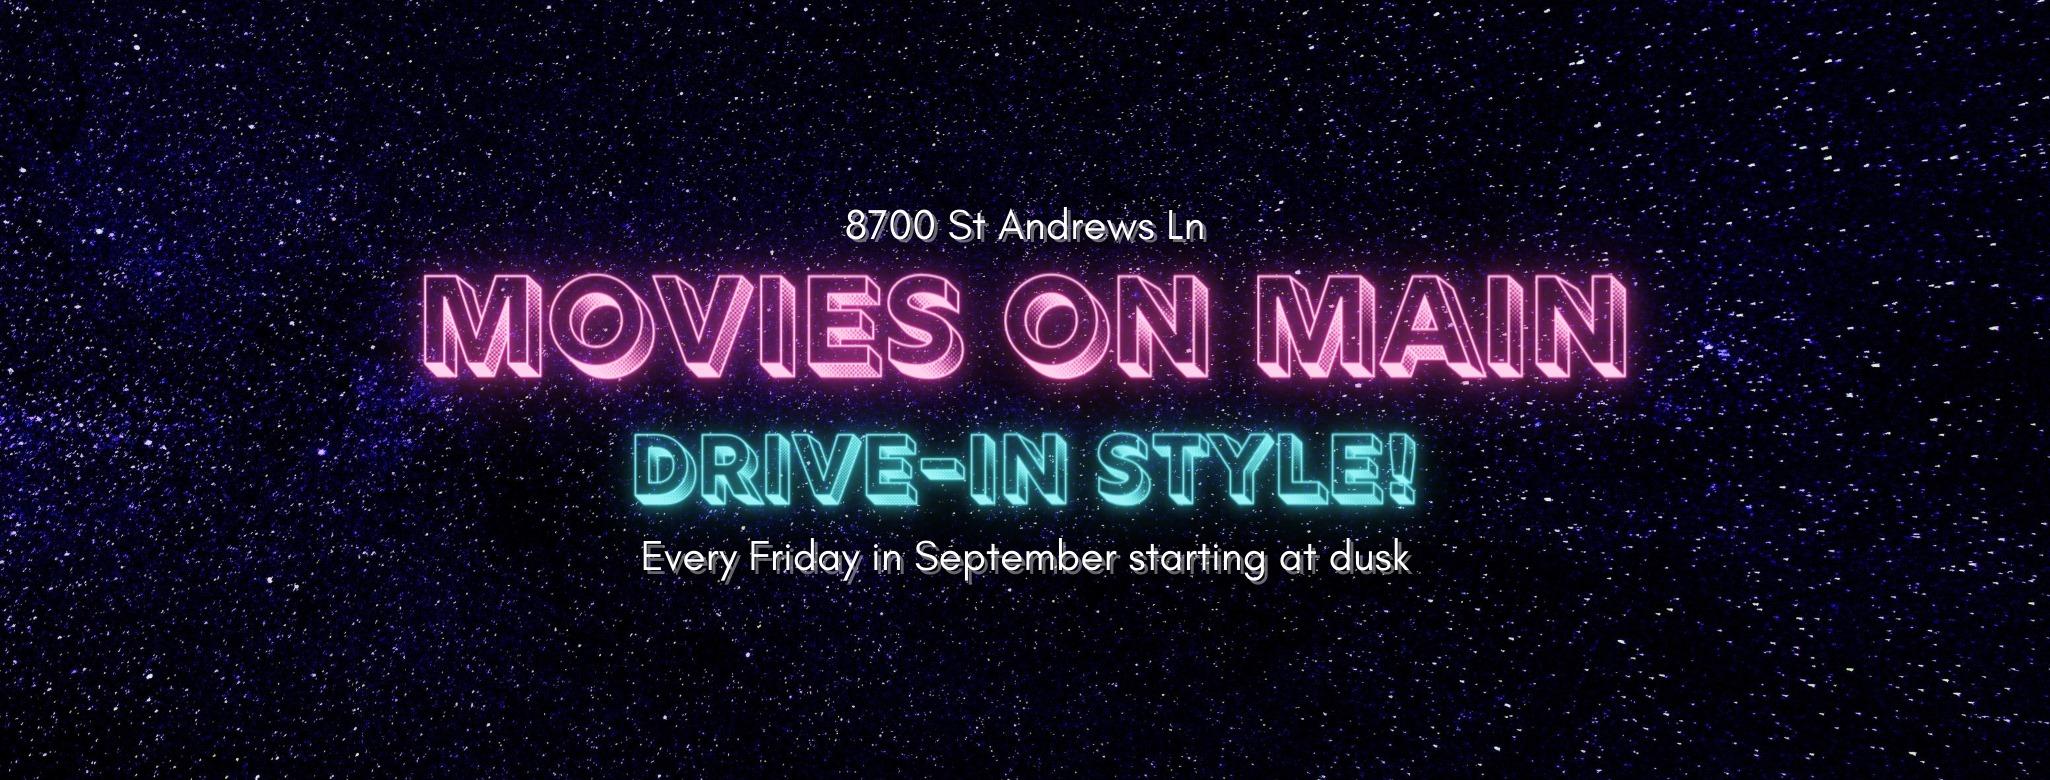 Rowlett's Drive-In Movies on Main